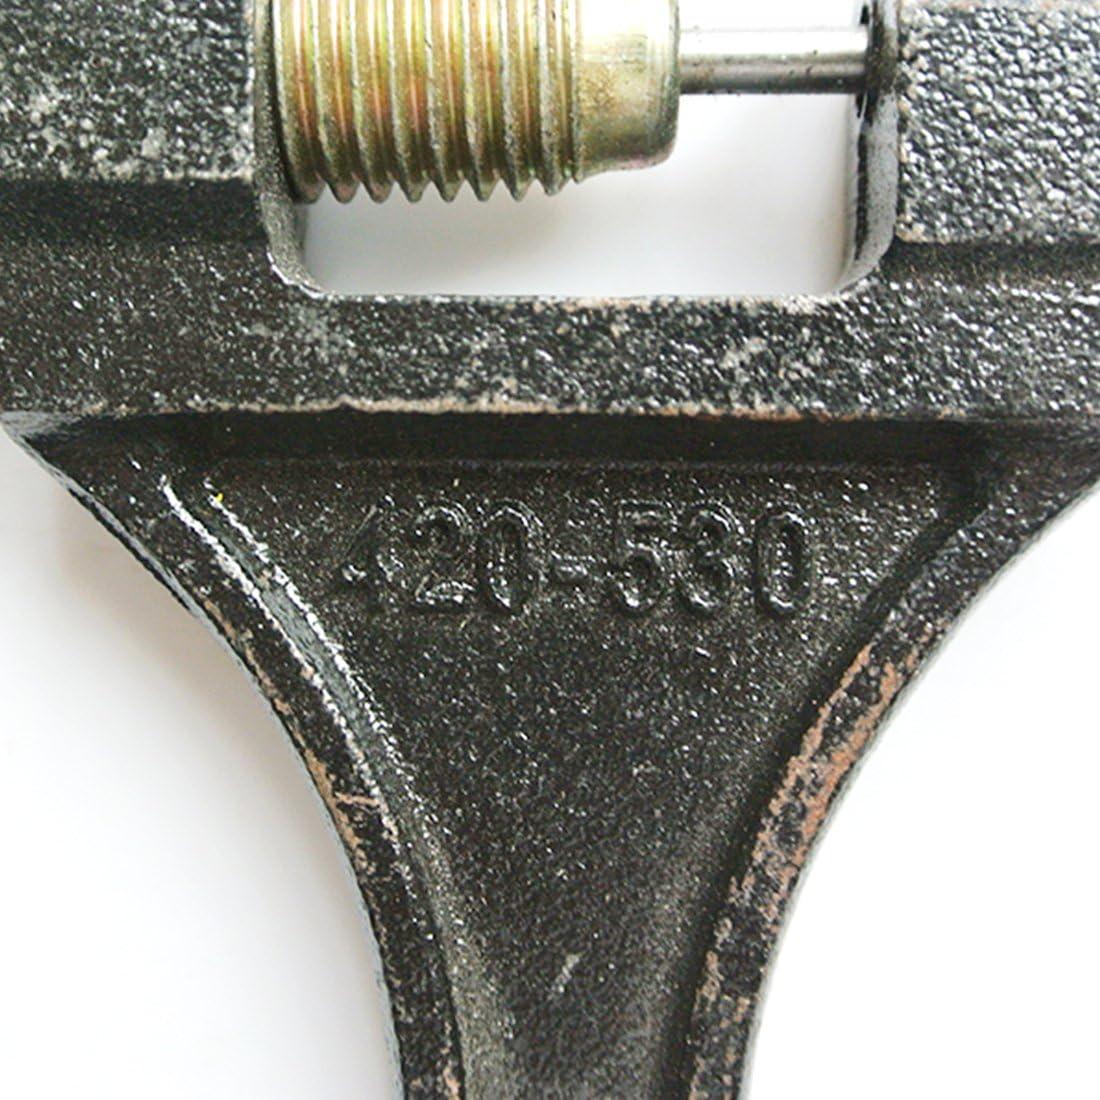 ATV Motorcycle Bike Chain Breaker Link Splitter Pin Remover Repair Tool 420-530